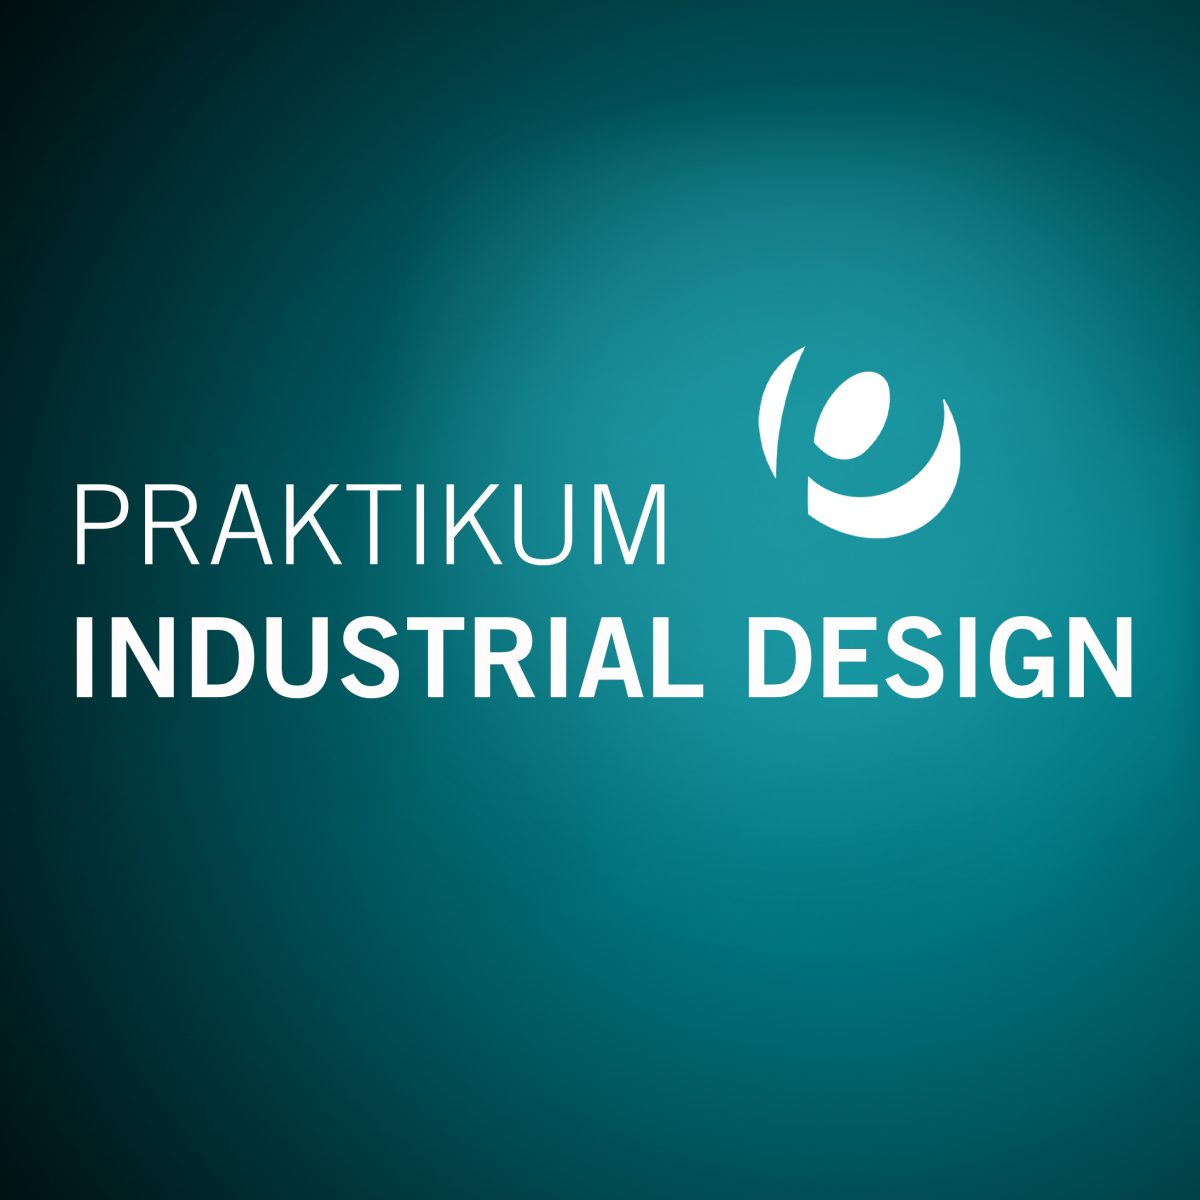 projekter_industrial_design_praktikum